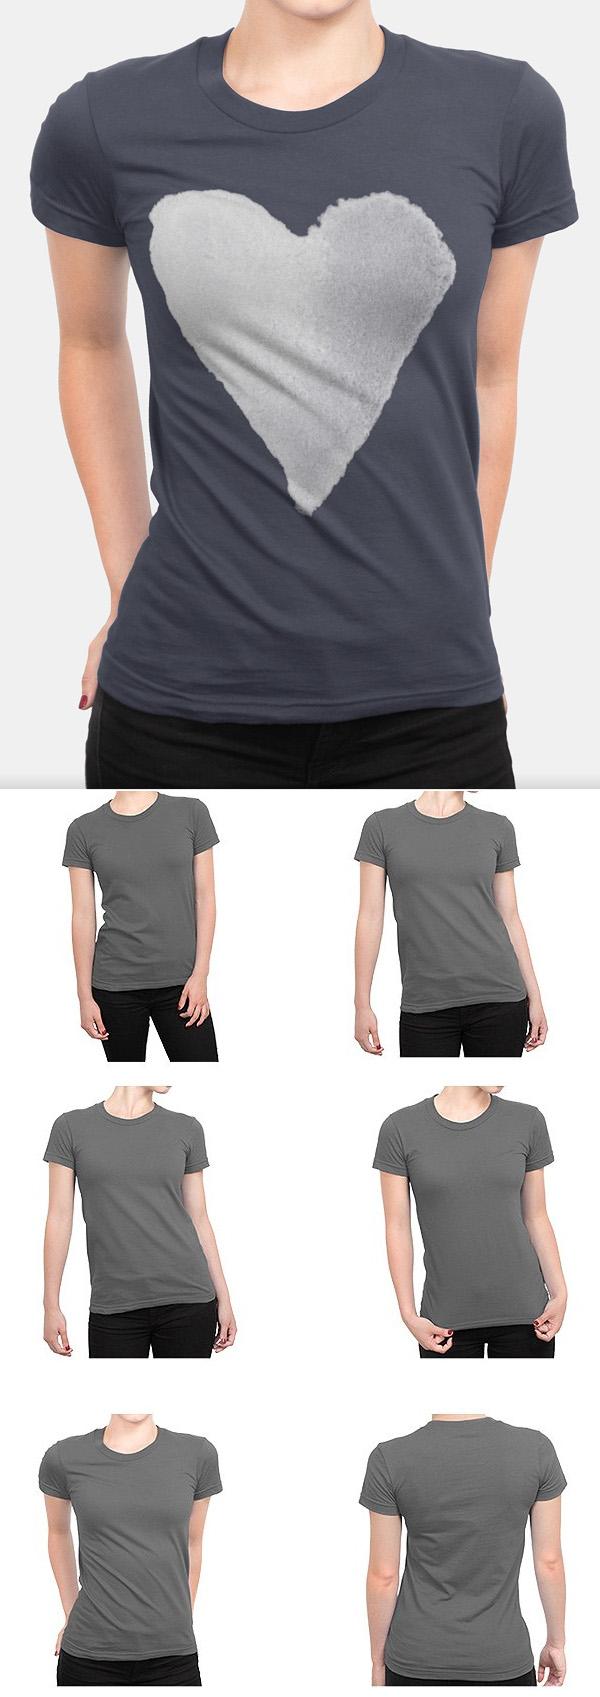 Women's T-Shirt Apparel Mockups